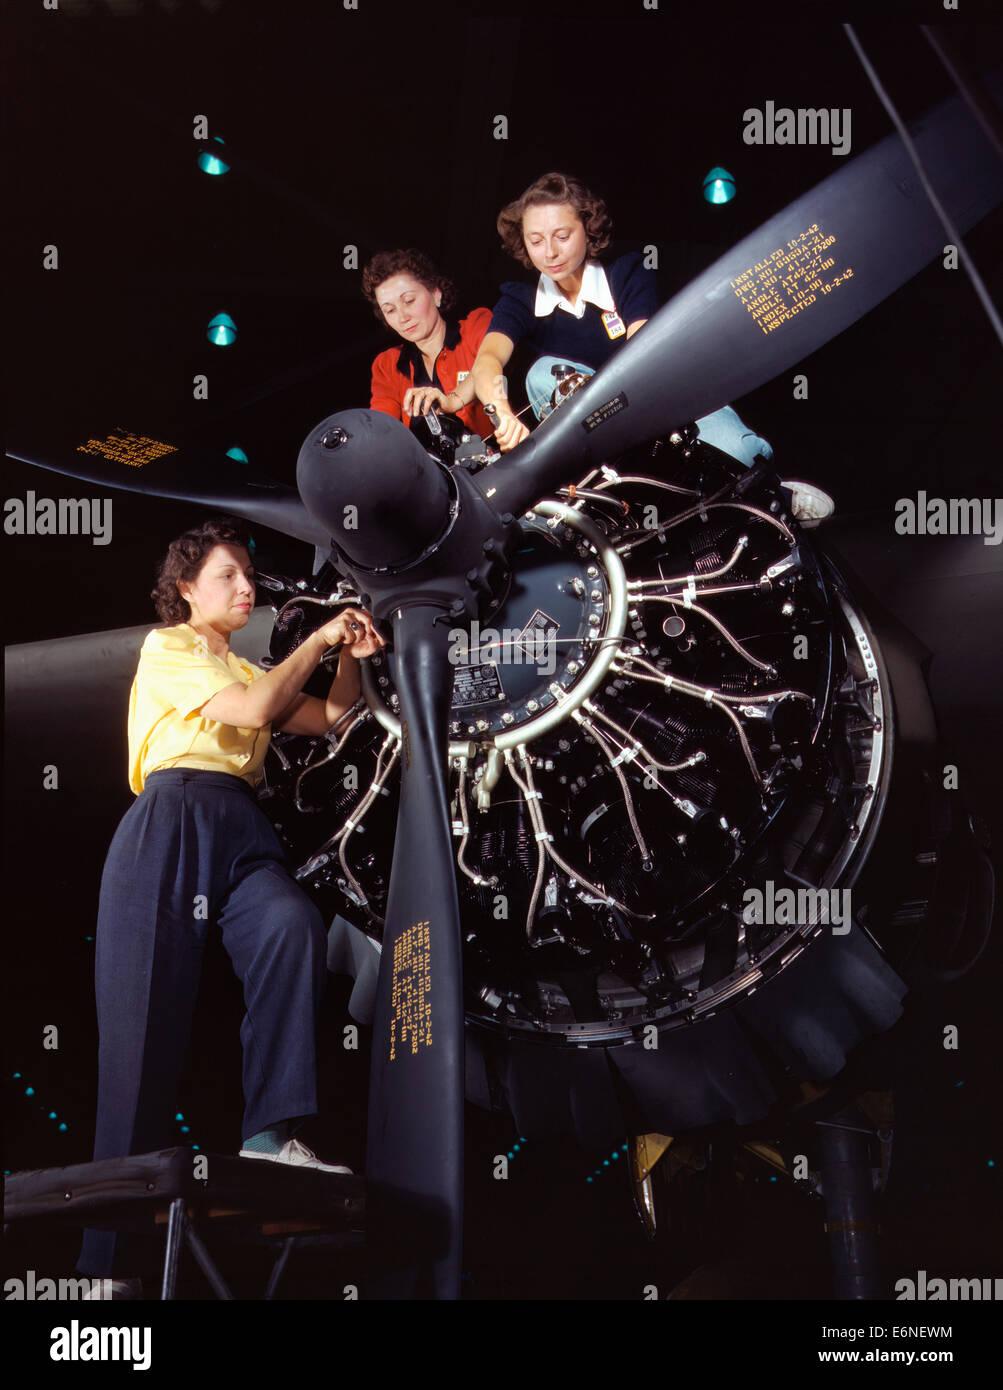 Women at work on C-47 Douglas cargo transport, Douglas Aircraft Company, Long Beach, California, 1942 - Stock Image